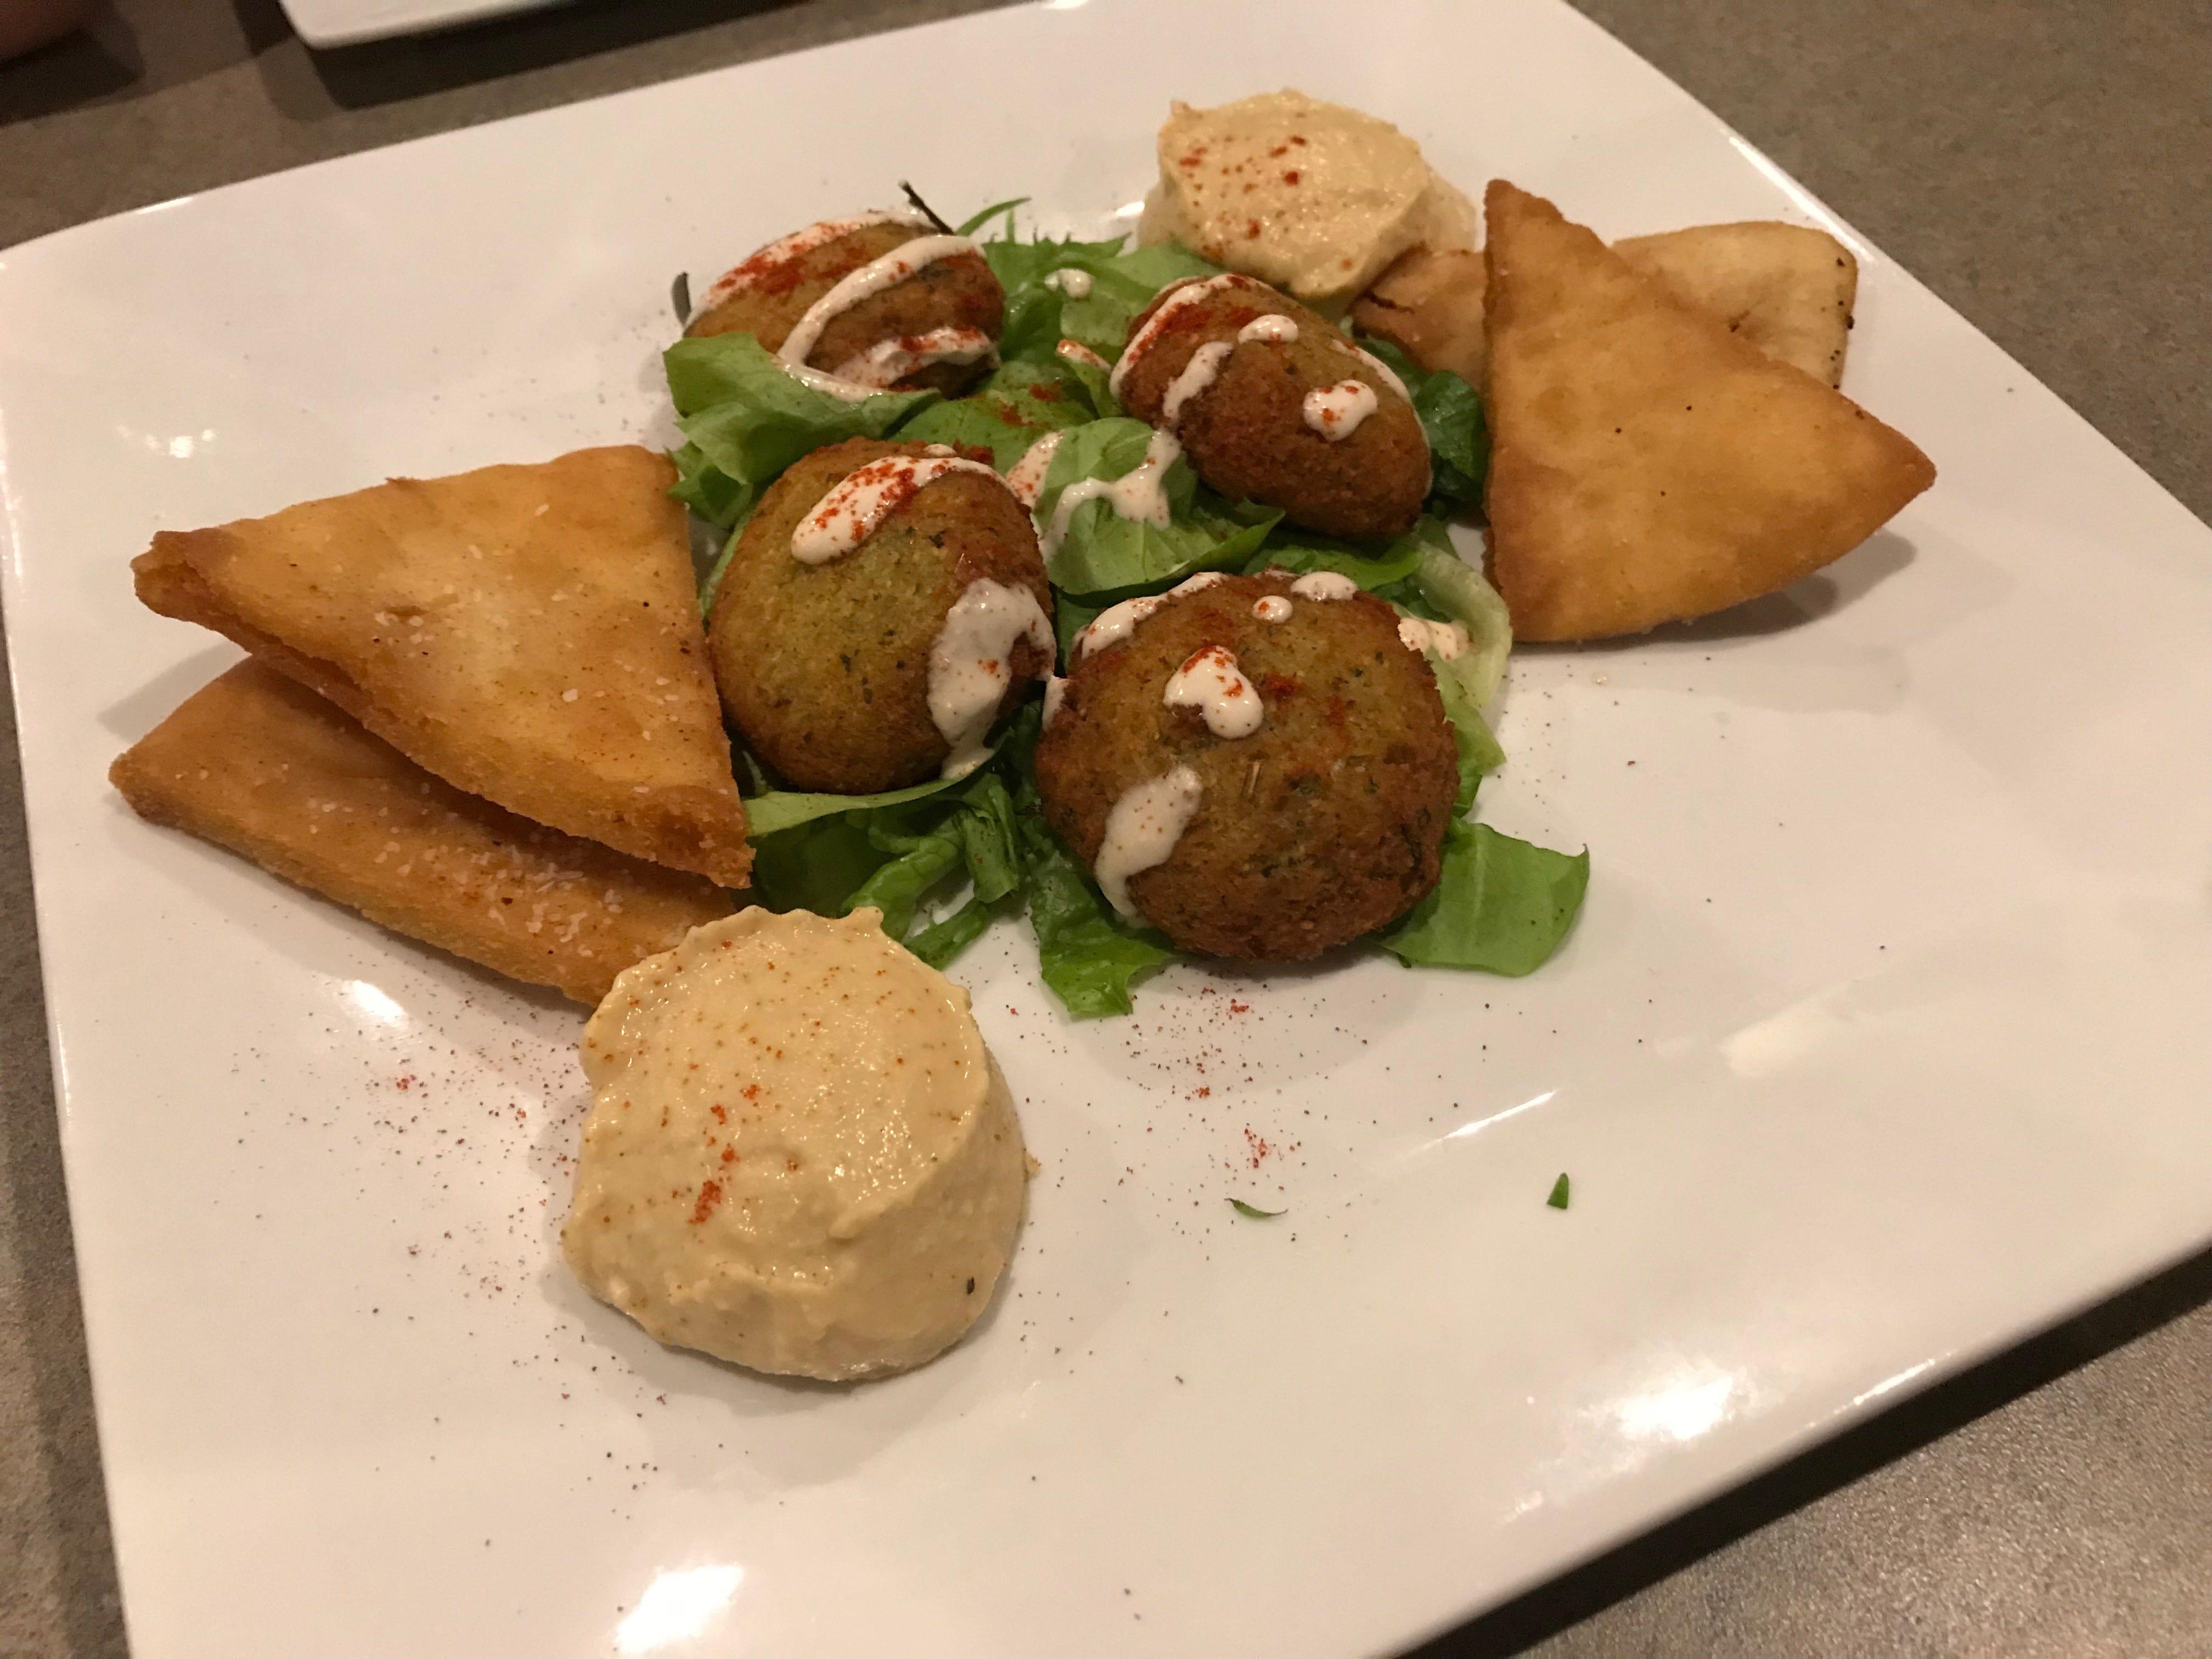 This falafel appetizer at Holla came with garlic and lemon hummus and pita chips.